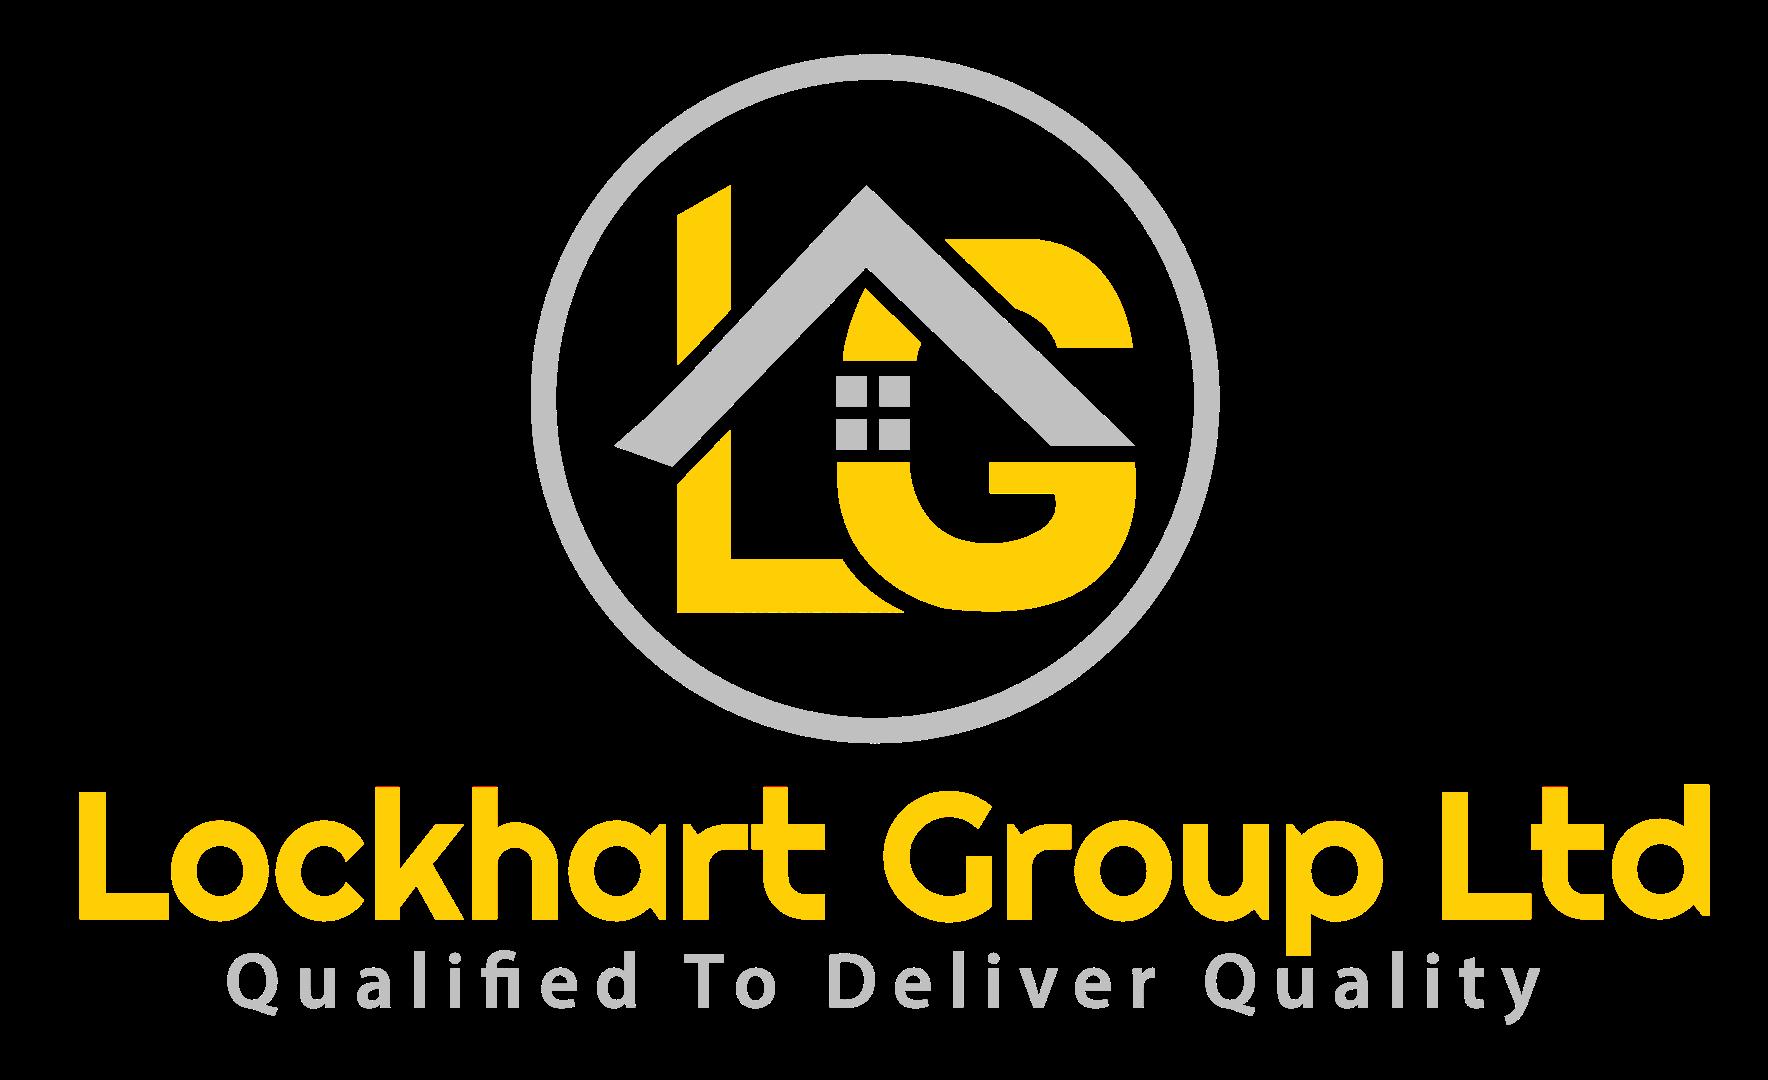 Lockhart Group